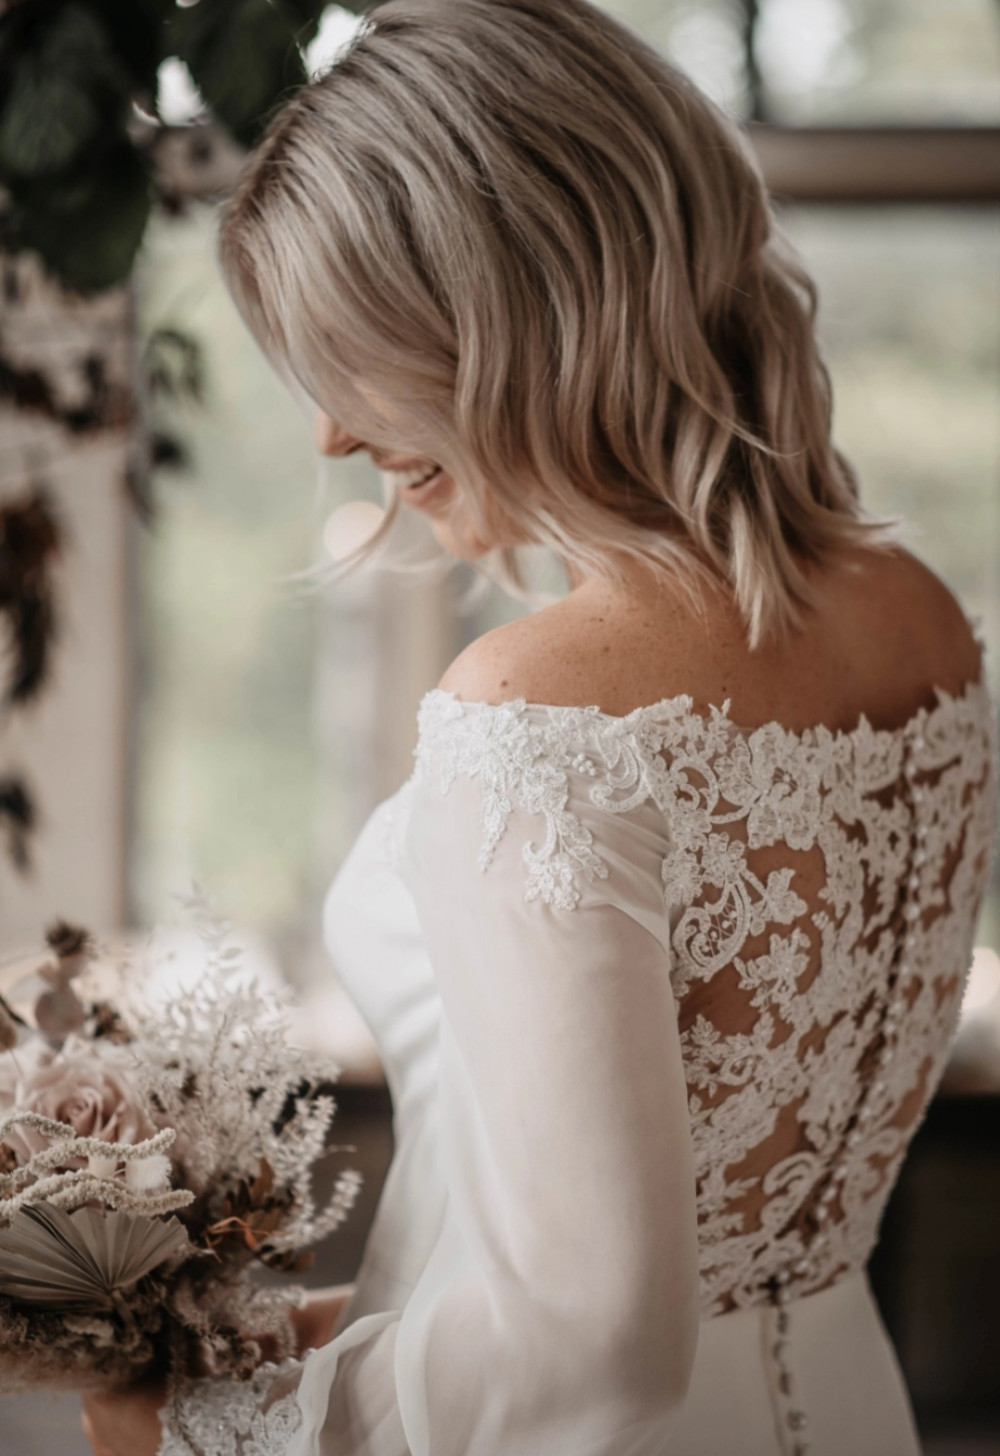 Beautiful Brides Curls - Make Me Bridal Artist: Elegant Bridal Hairstyling. Photography by: Willow & Wilde. #curls #bridalhair #weddinghair #smoothcurls #bridalhairstylist #loosecurls #waves